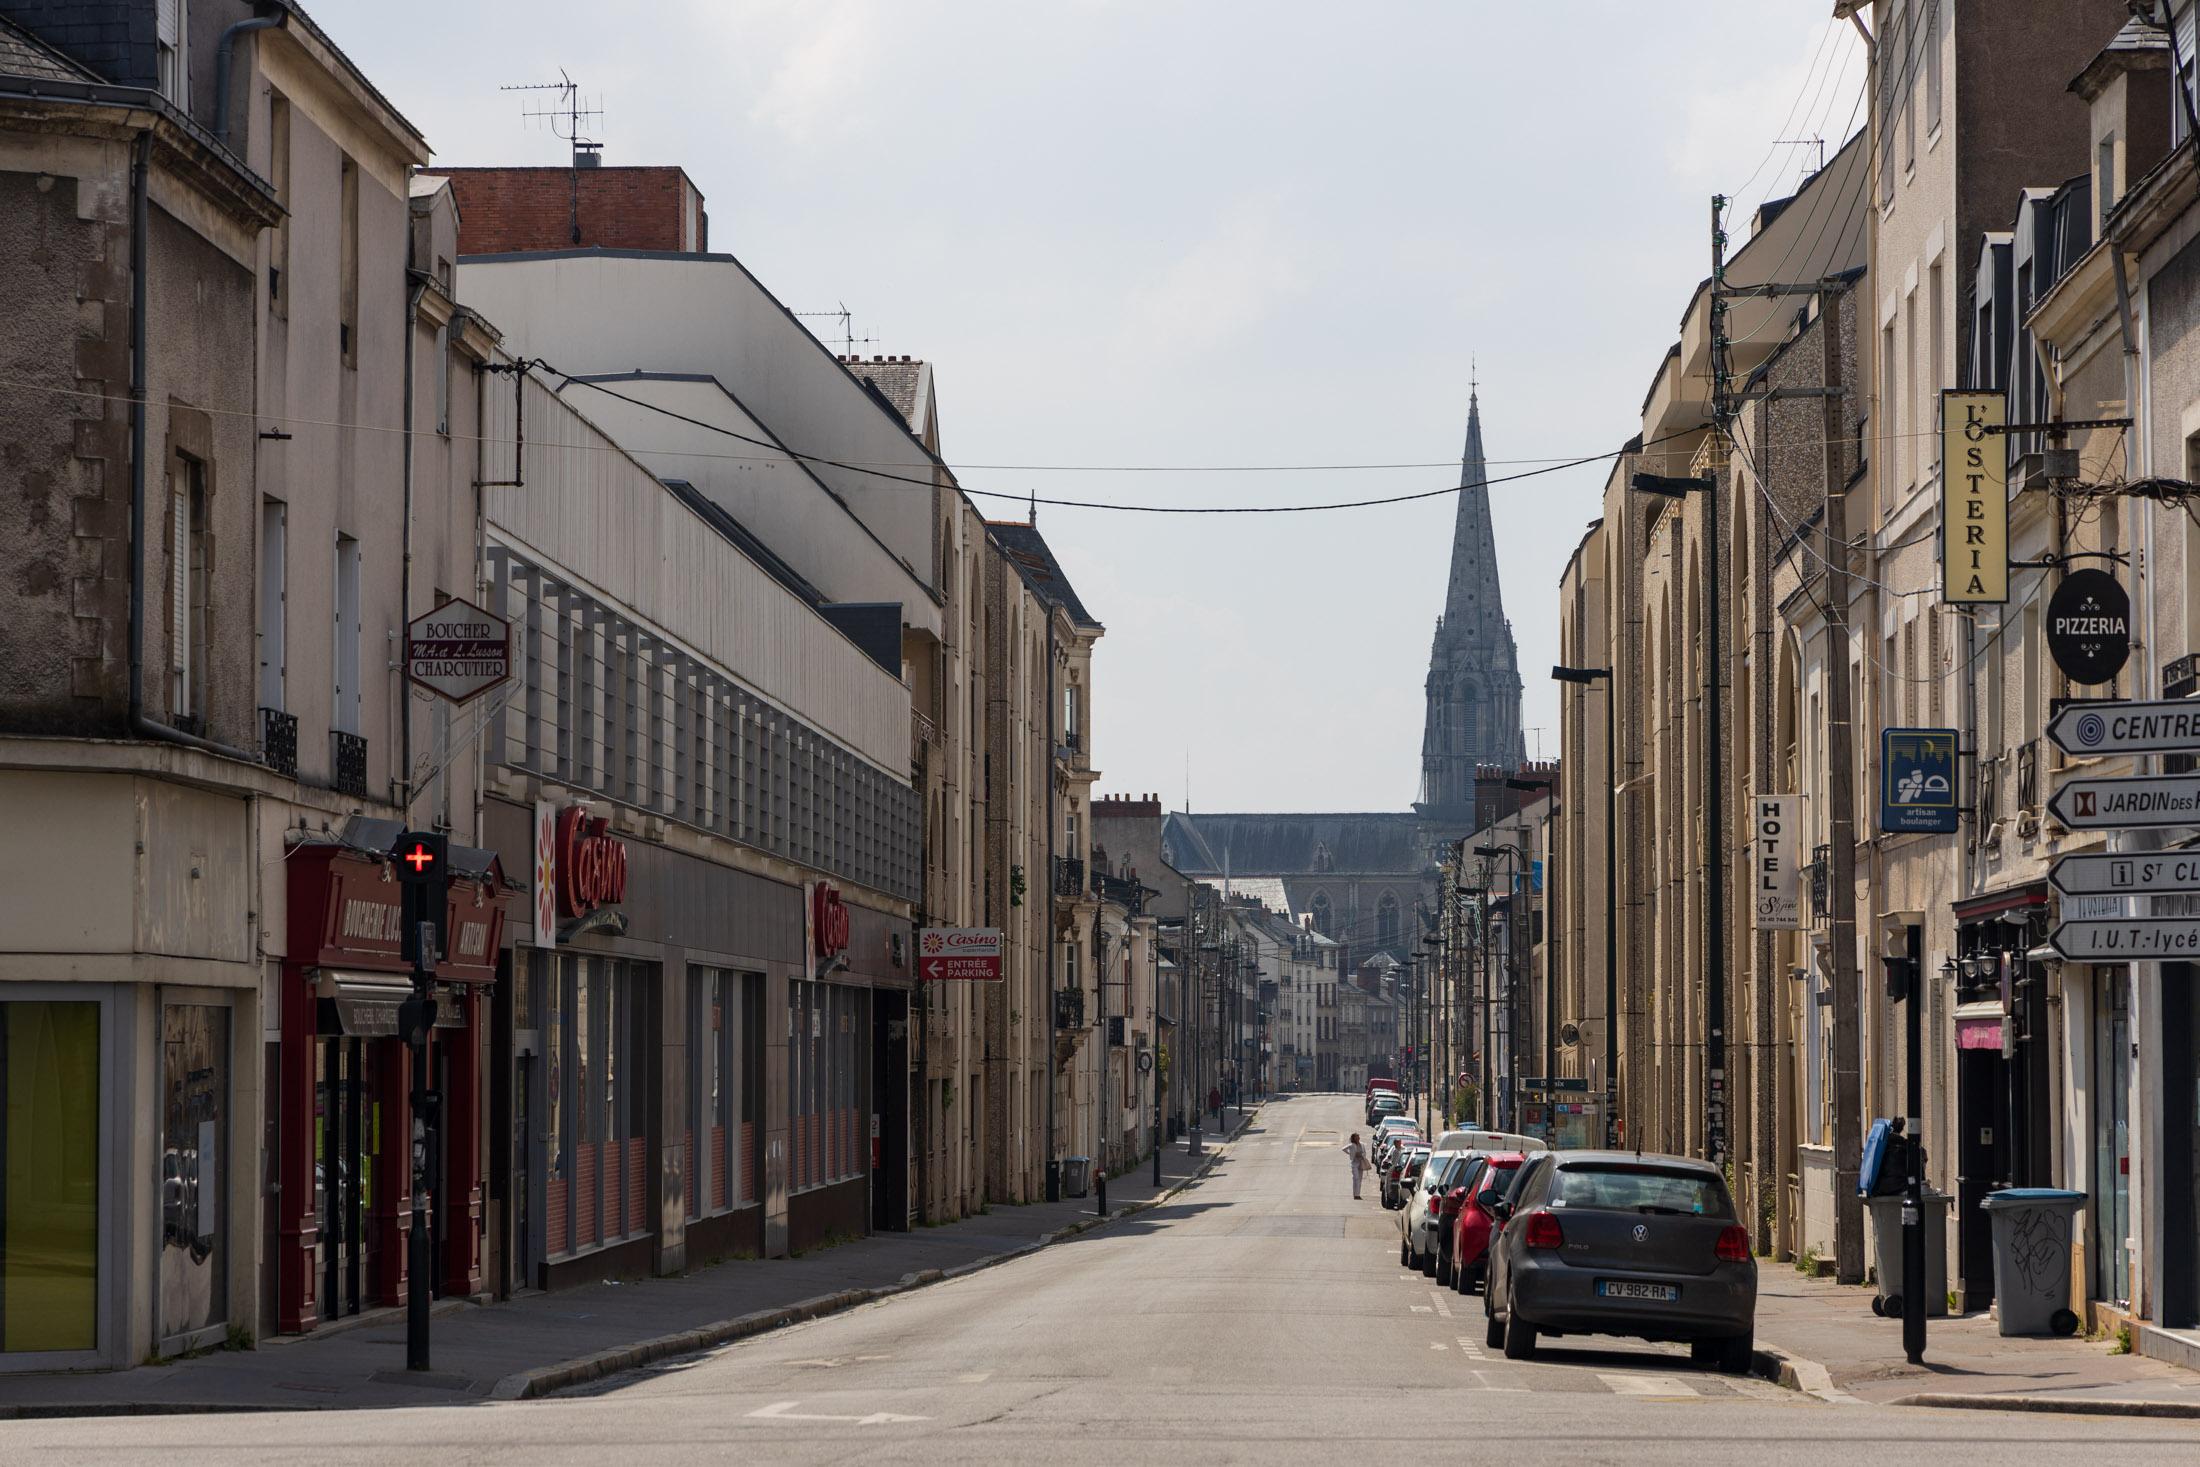 General Buat street is empty. Nantes, France - April 26th 2020.La rue du General Buat vide. Nantes, France - 26 avril 2020.